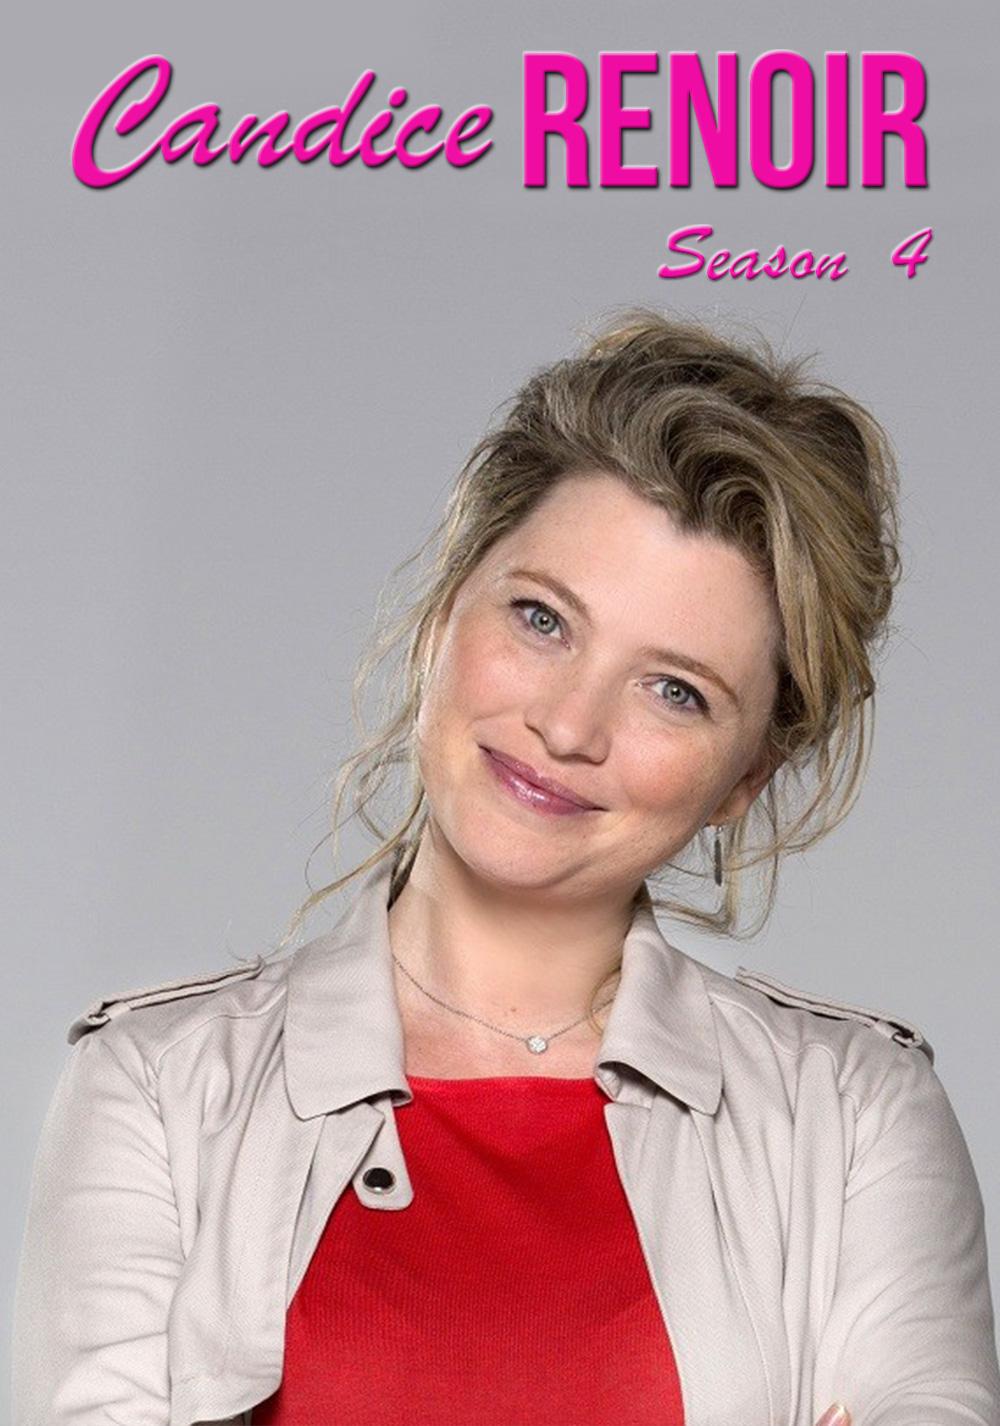 Season 6 Of Candice Renoir 2013 Plex